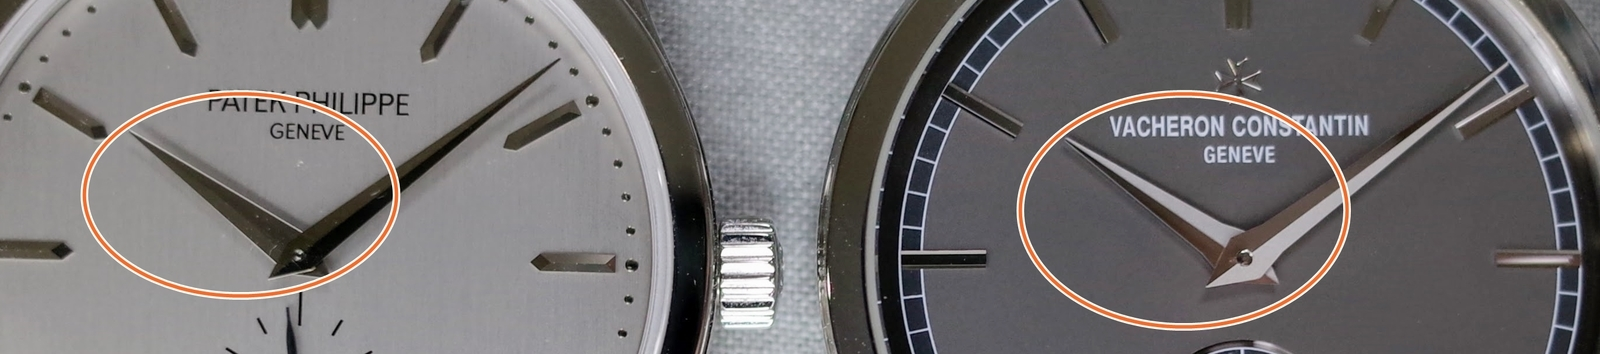 f:id:suits:20200618232710j:plain